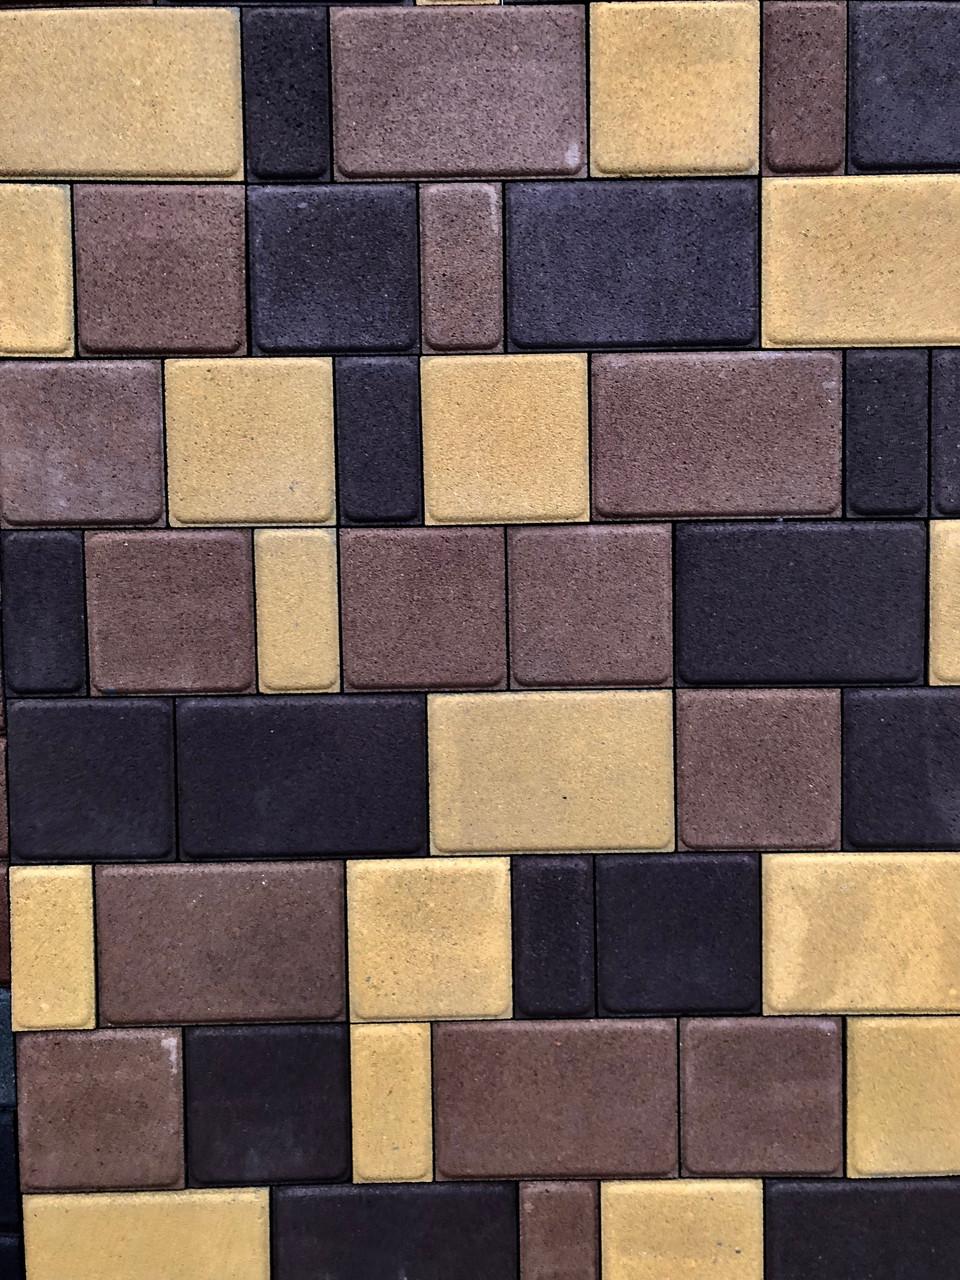 Тротуарная плитка Брук Ландхаус стенд 2